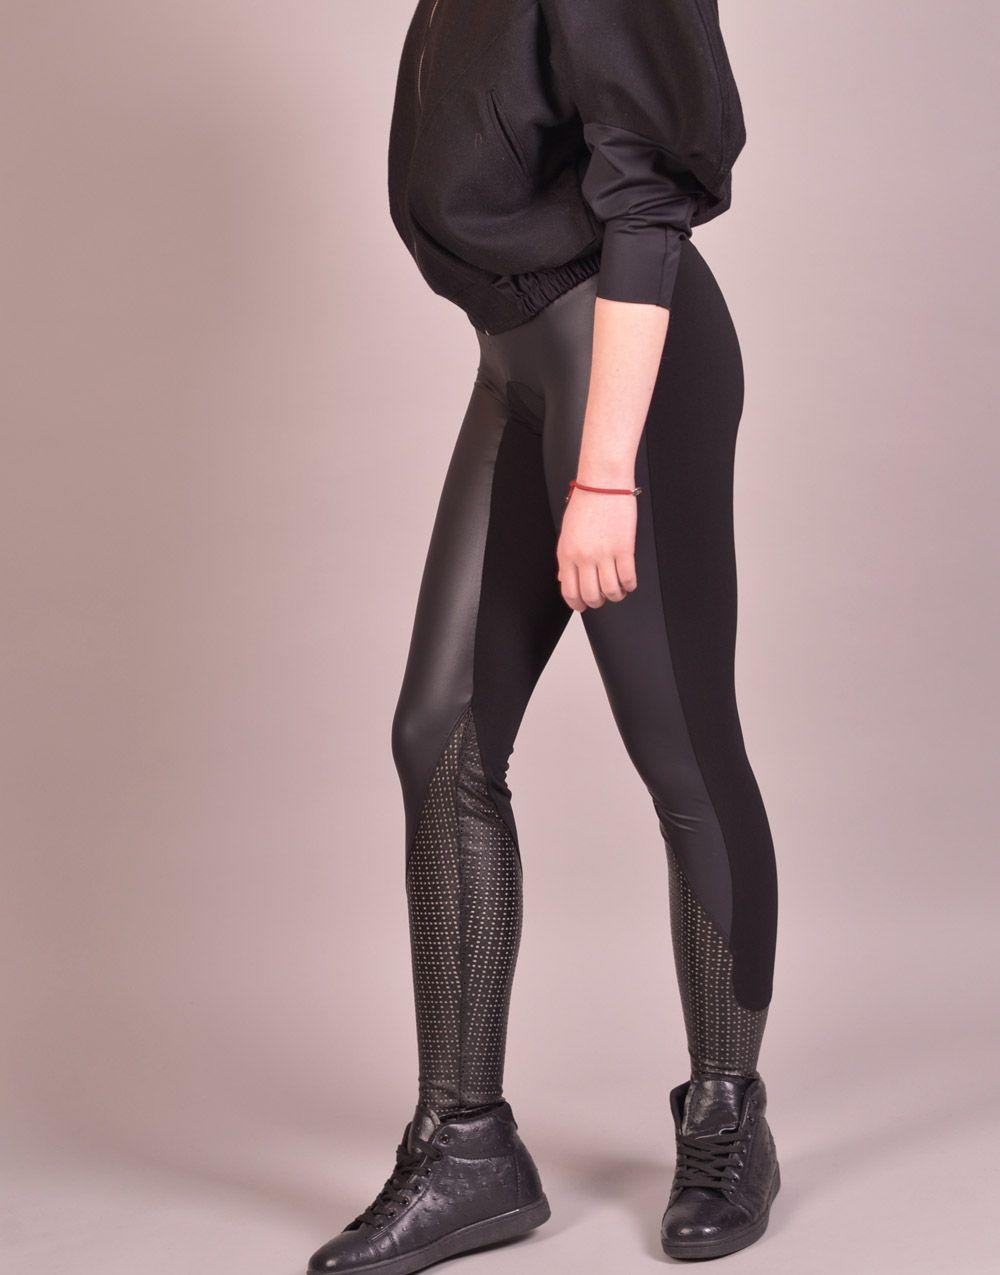 d68e18080b4d5 Tight Leggings, Spandex Leggings, Black Leggings, Yoga Clothing, Workout  Leggings, Sexy Pants, Gym Leggings, Sport Leggings